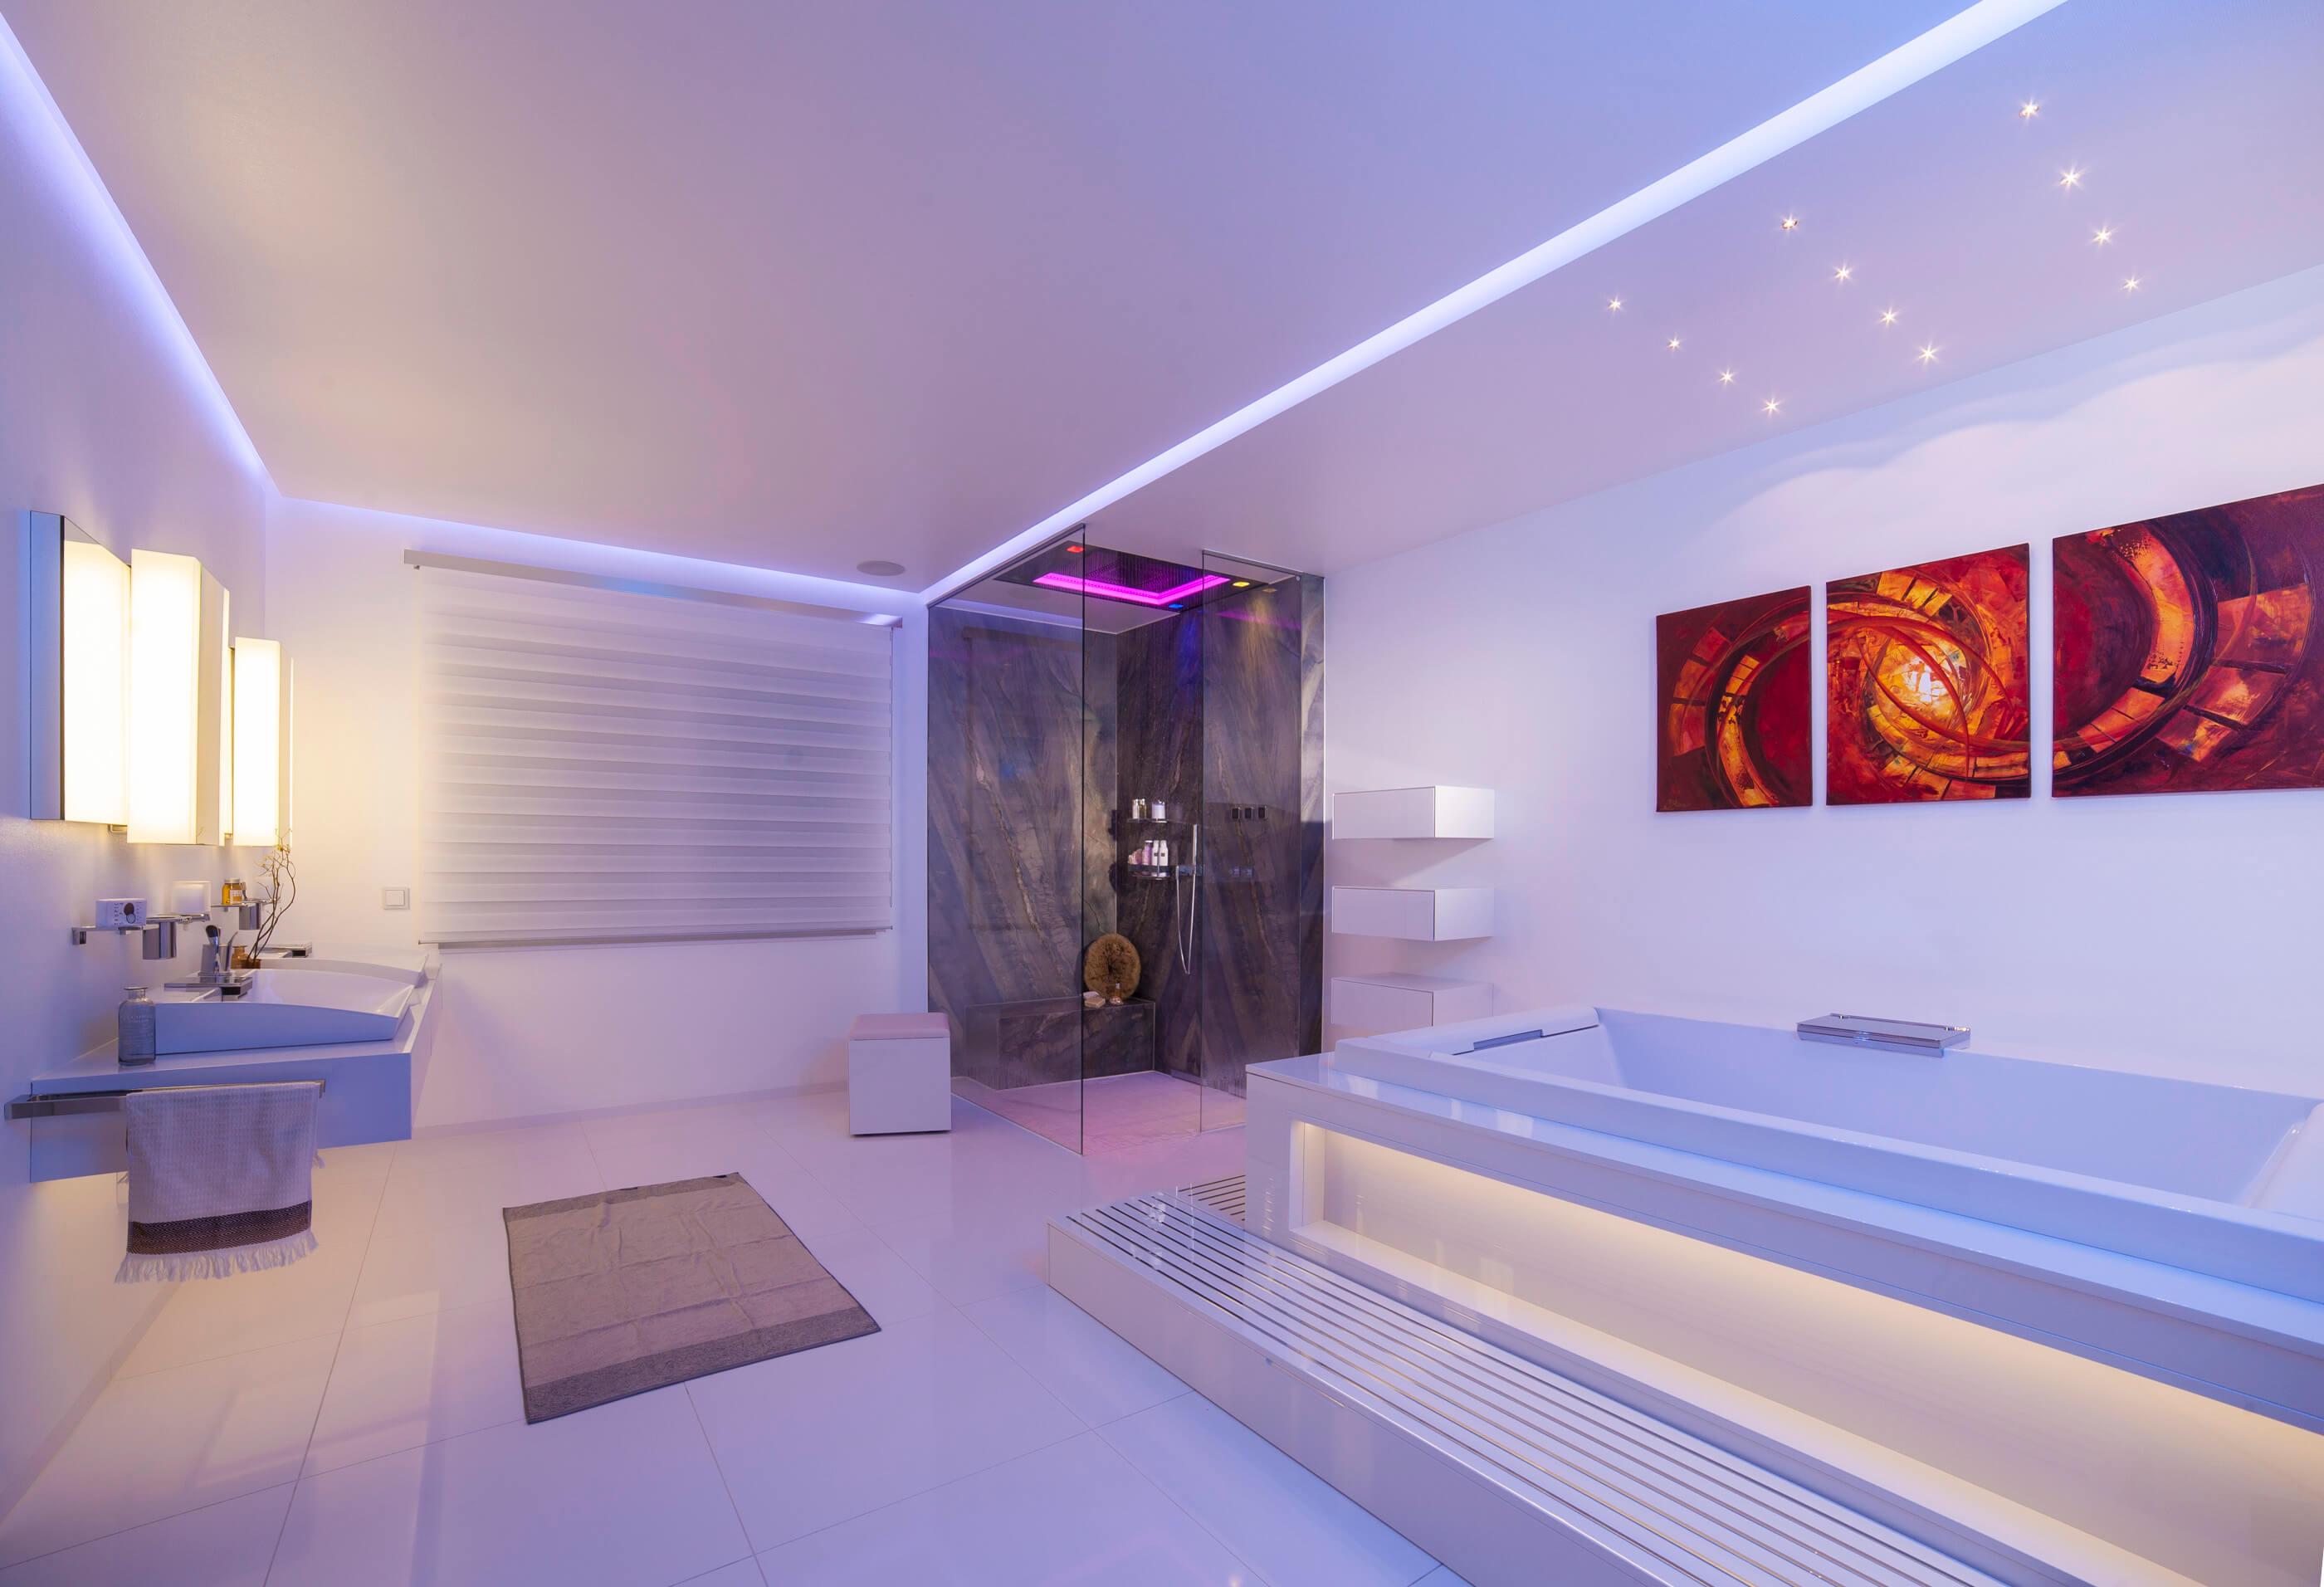 Exklusive Badezimmer Fliesen Haus Ideen